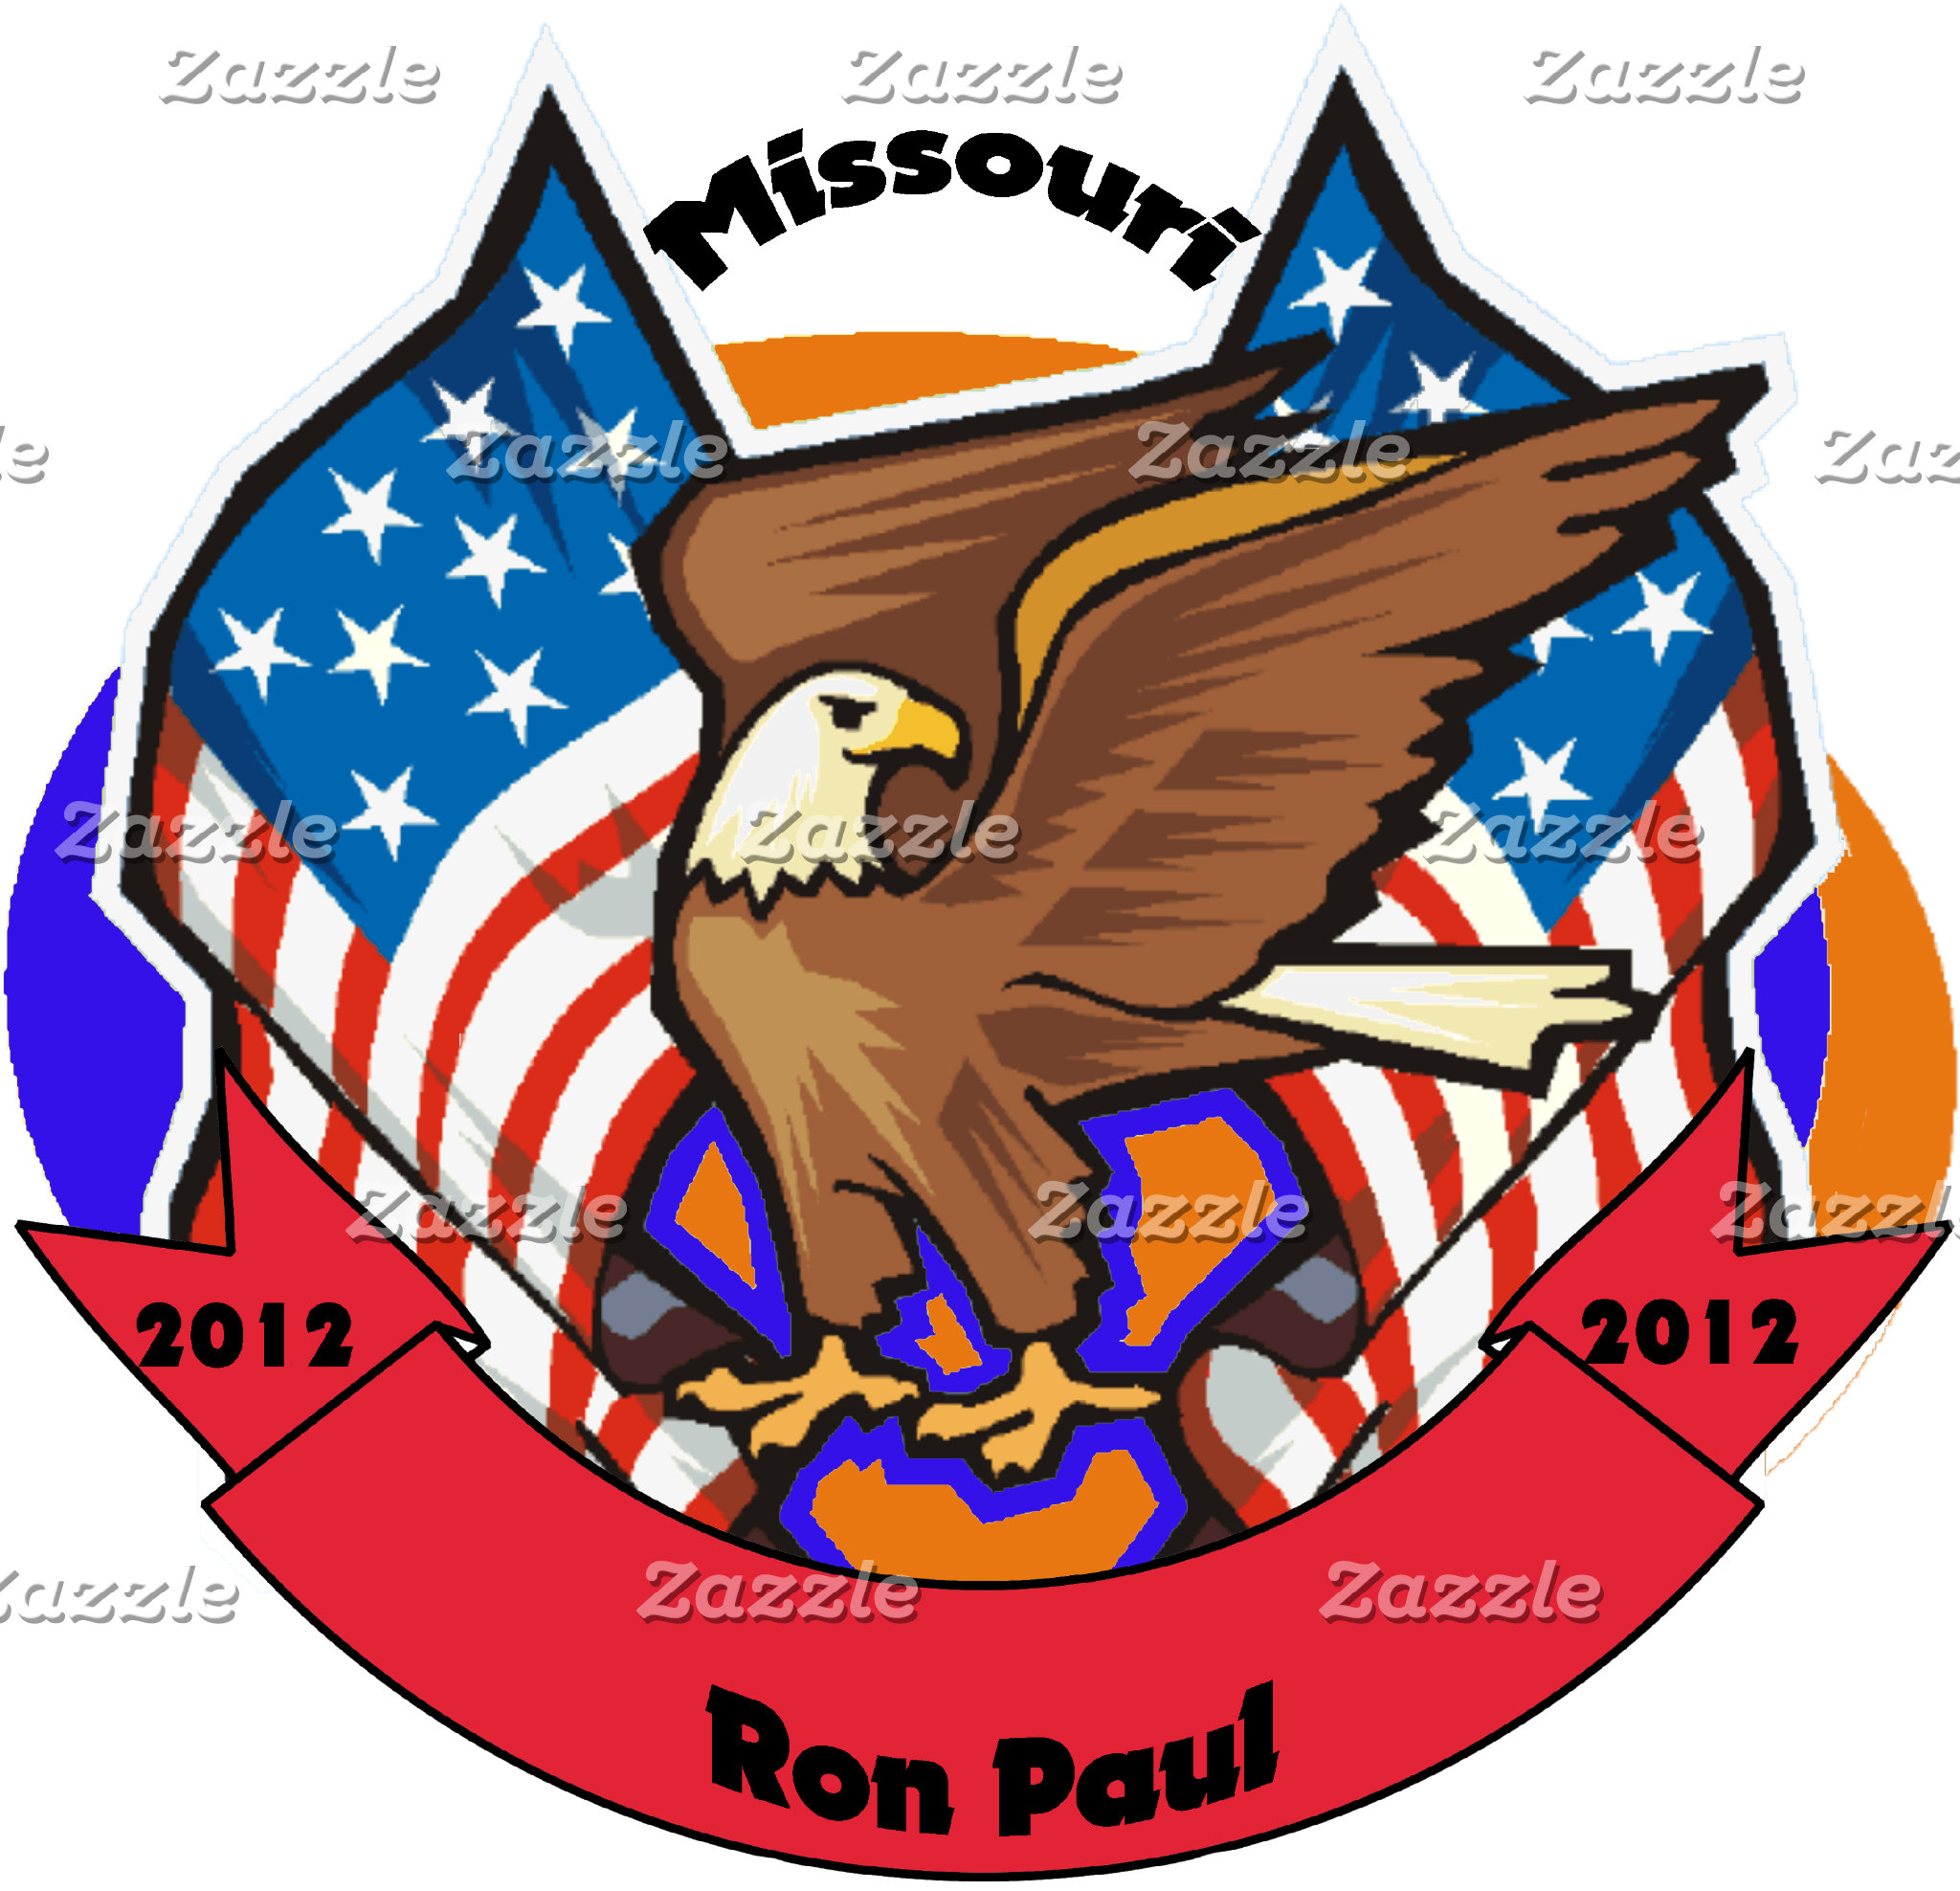 Missouri for Ron Paul